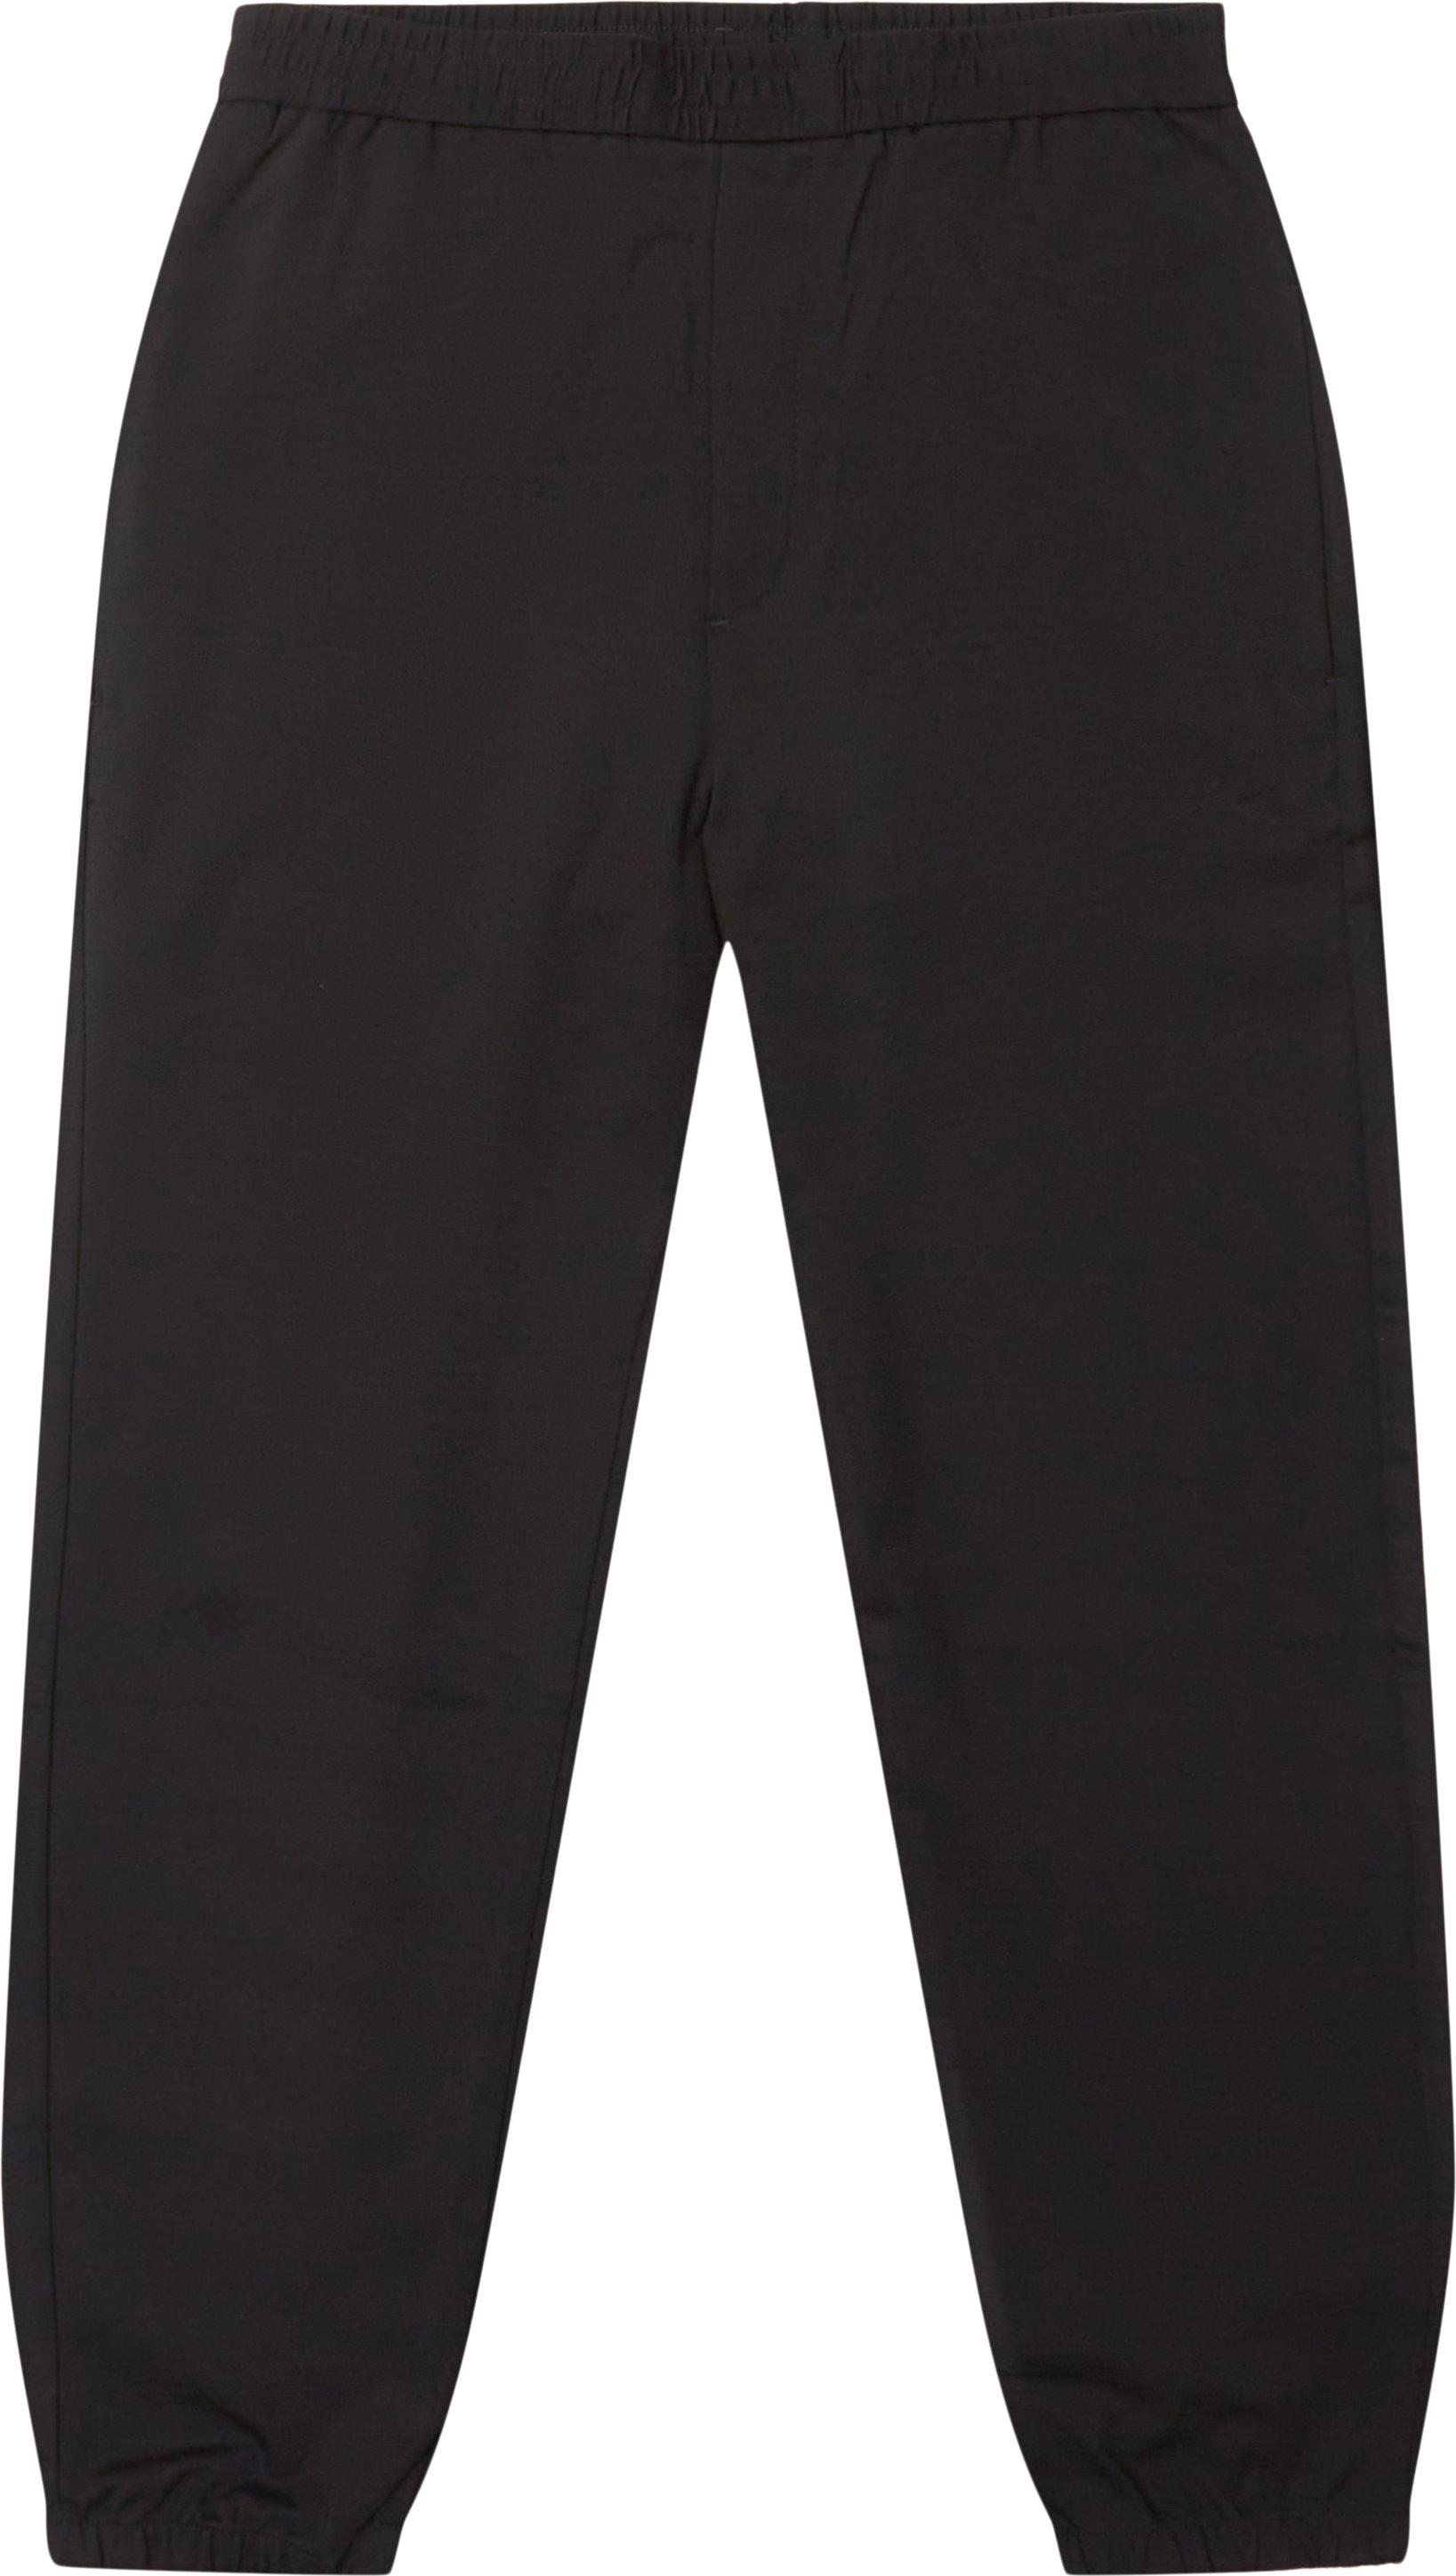 Chaplin Trackpants - Bukser - Regular fit - Sort